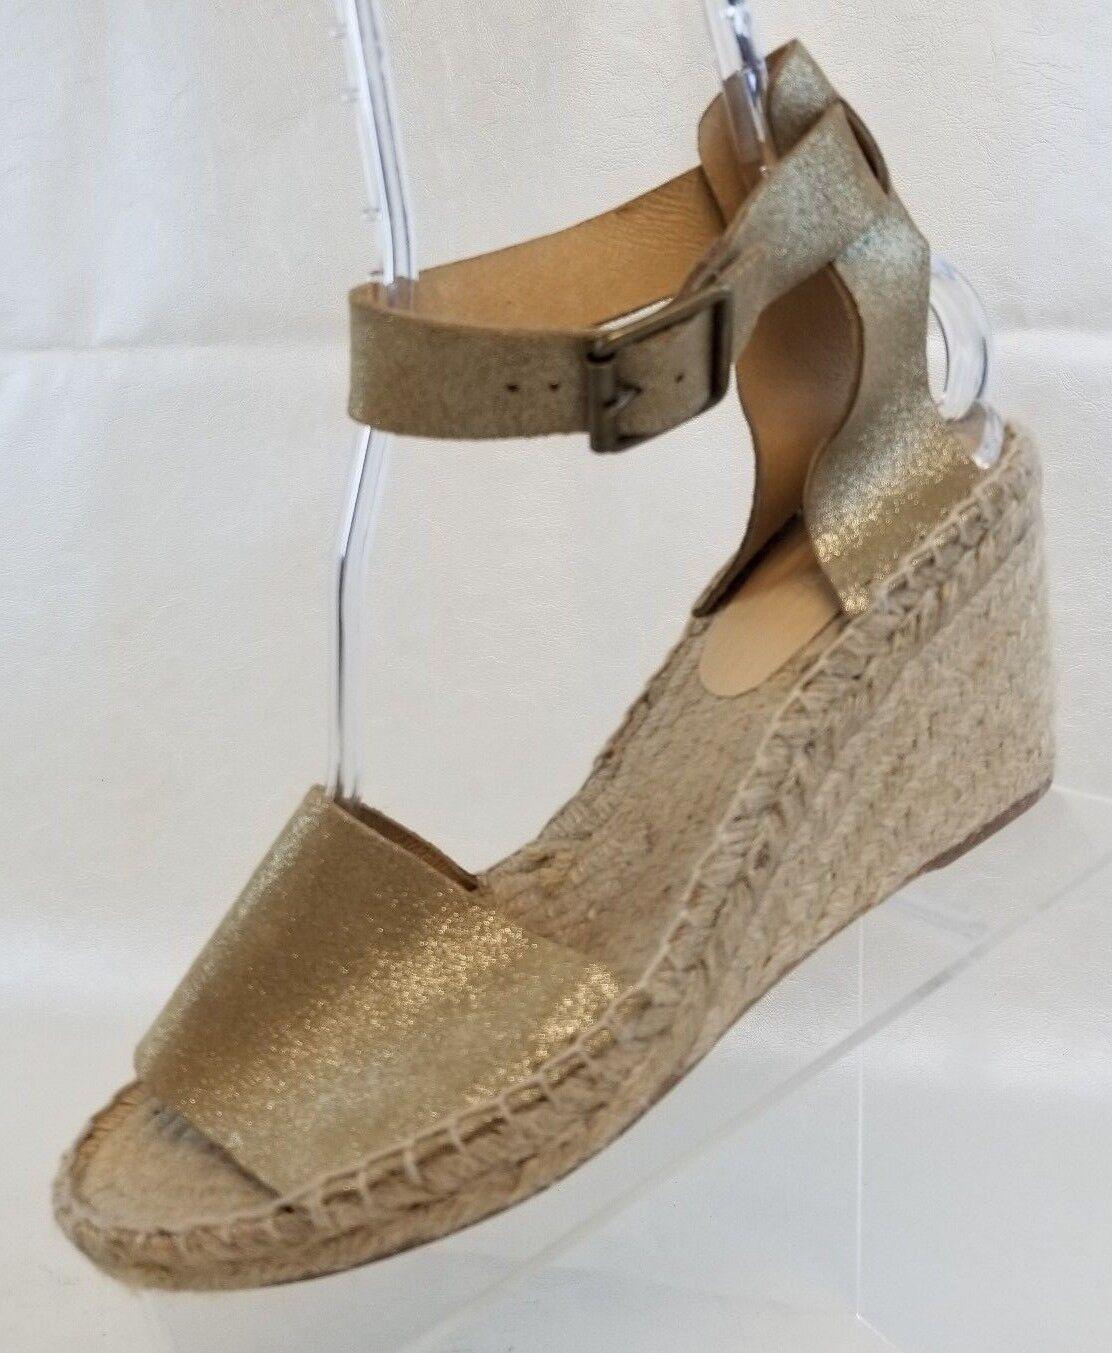 J Crew Sandals Corsica Espadrille Wedge Open Toe Womens gold Metallic shoes 10